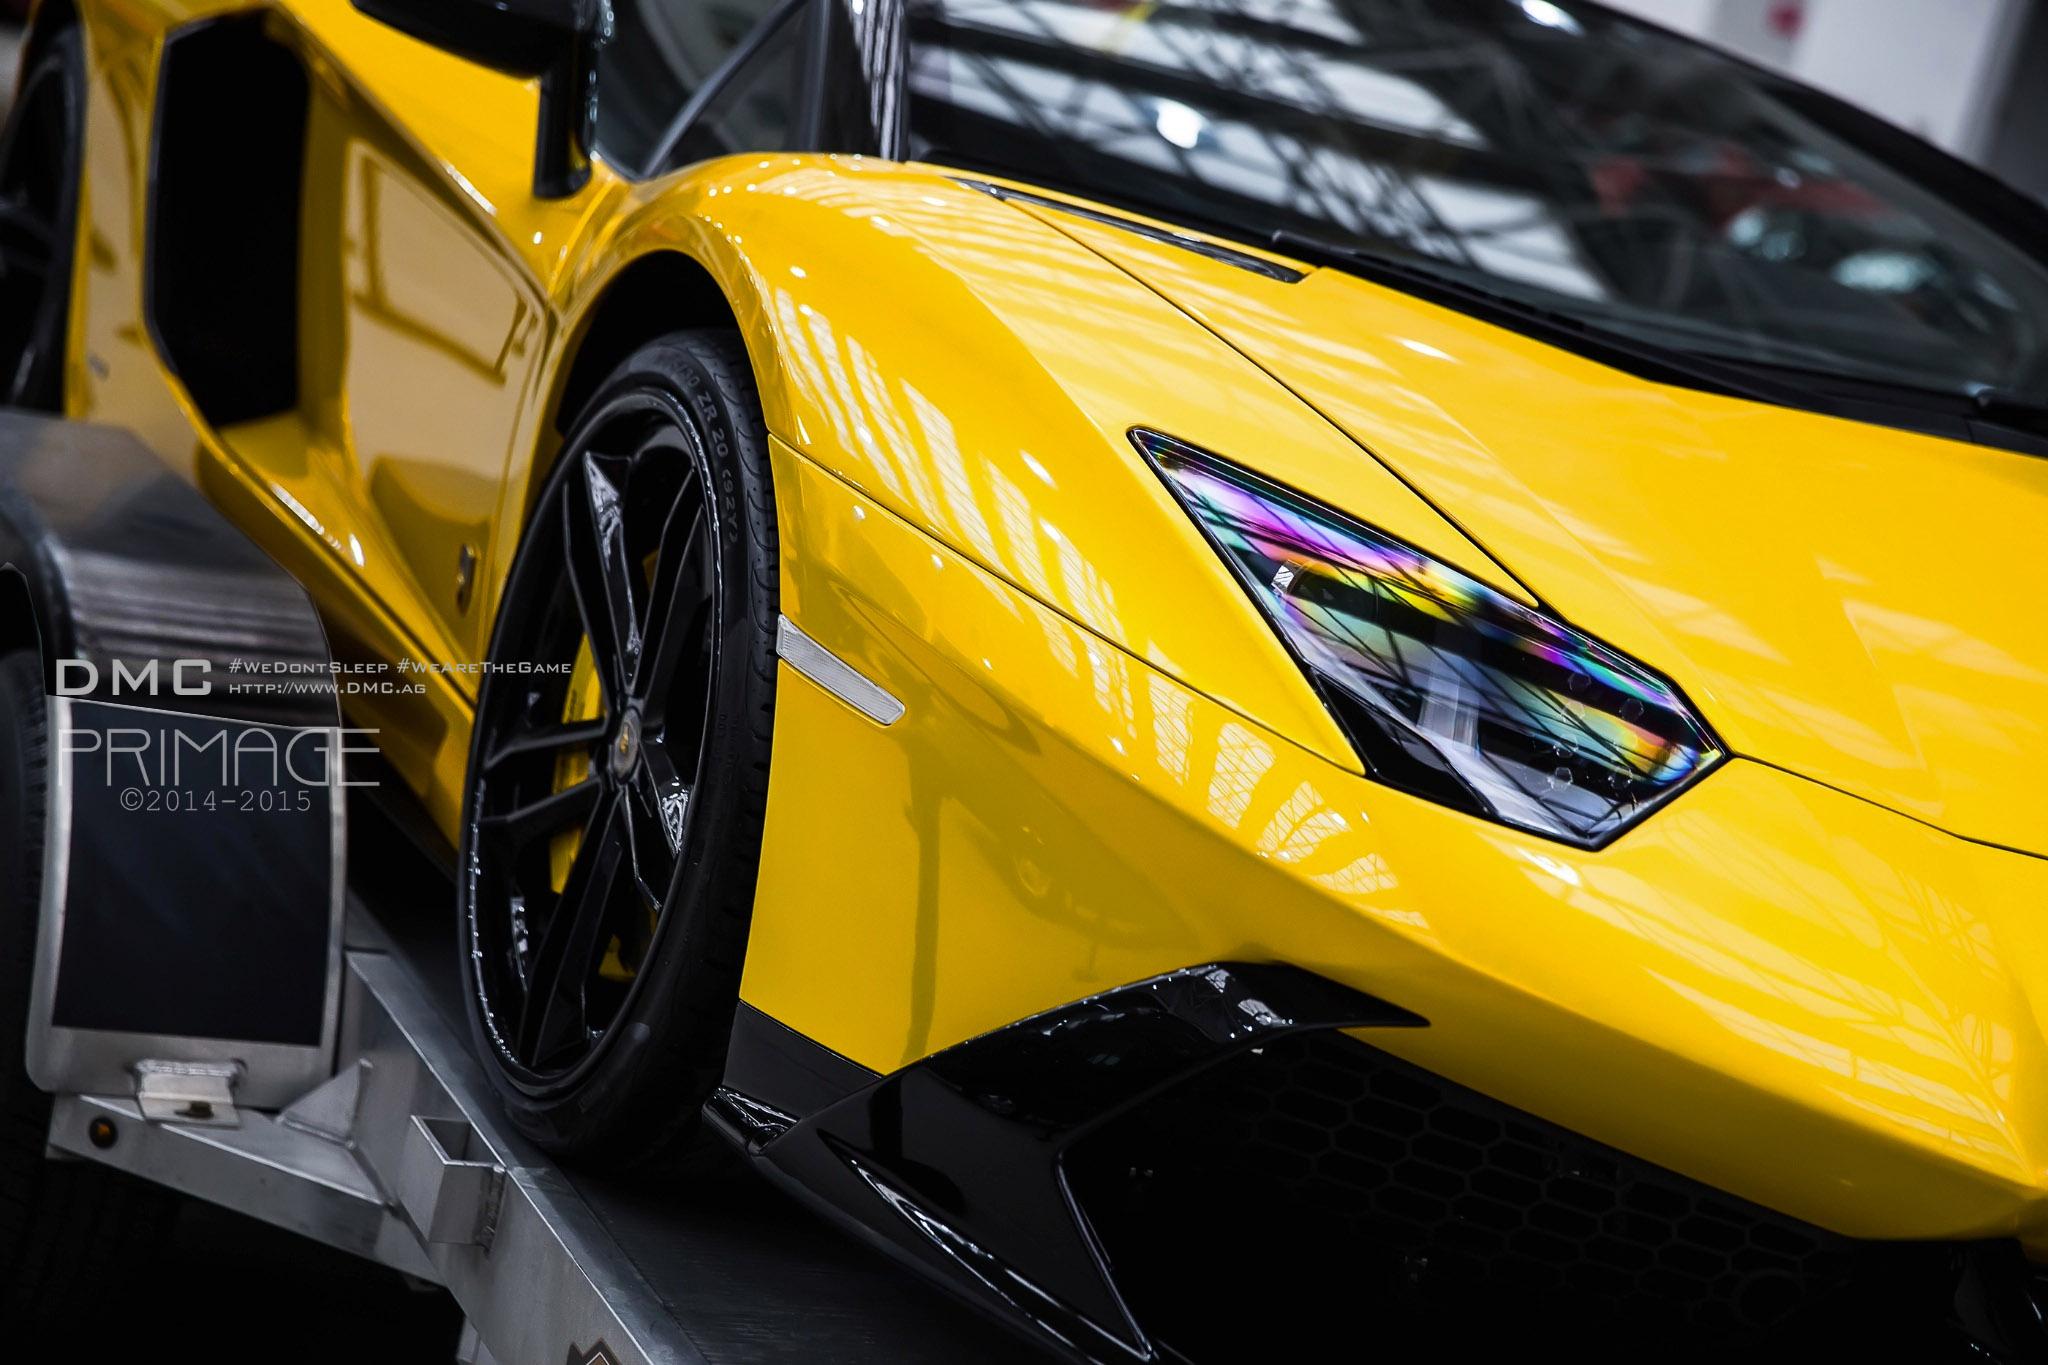 2014 DMC Lamborghini Aventador LP720 Roadster